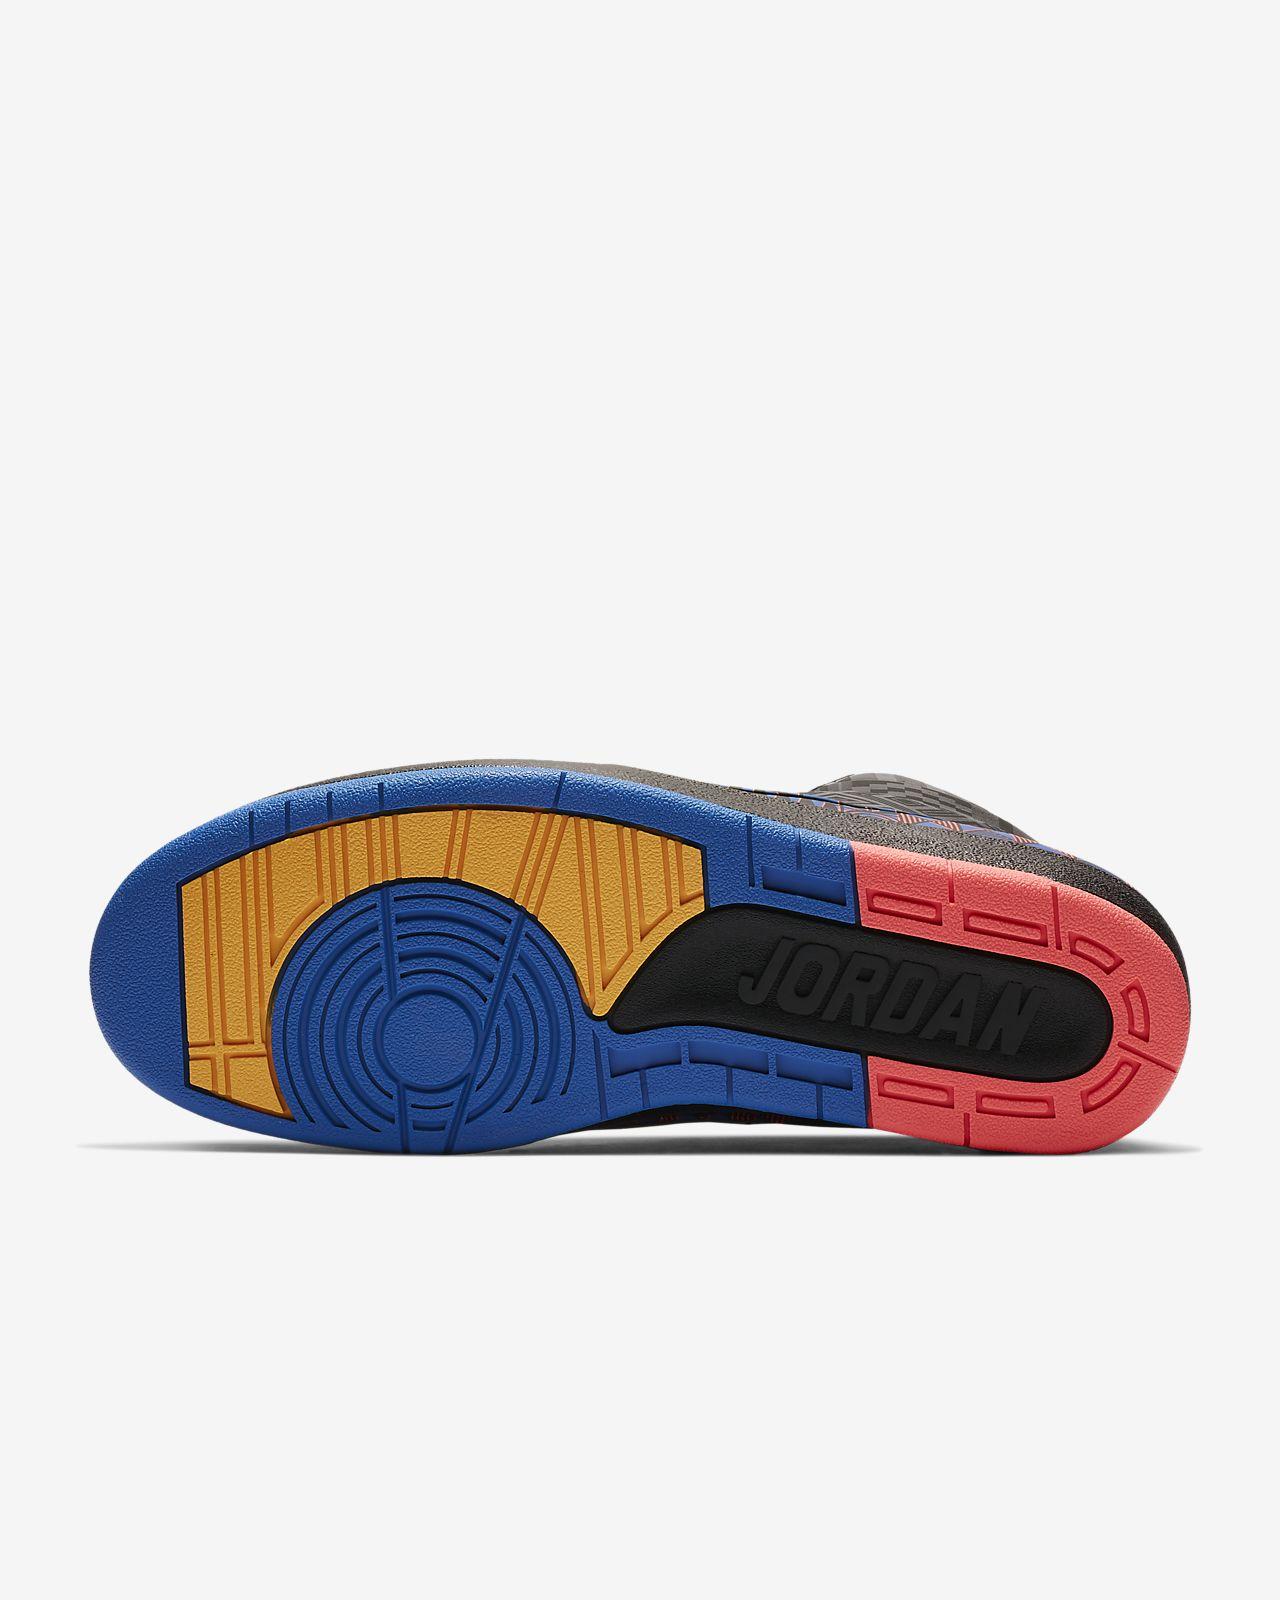 4b4d16a8742229 Air Jordan 2 Retro BHM Men s Shoe. Nike.com